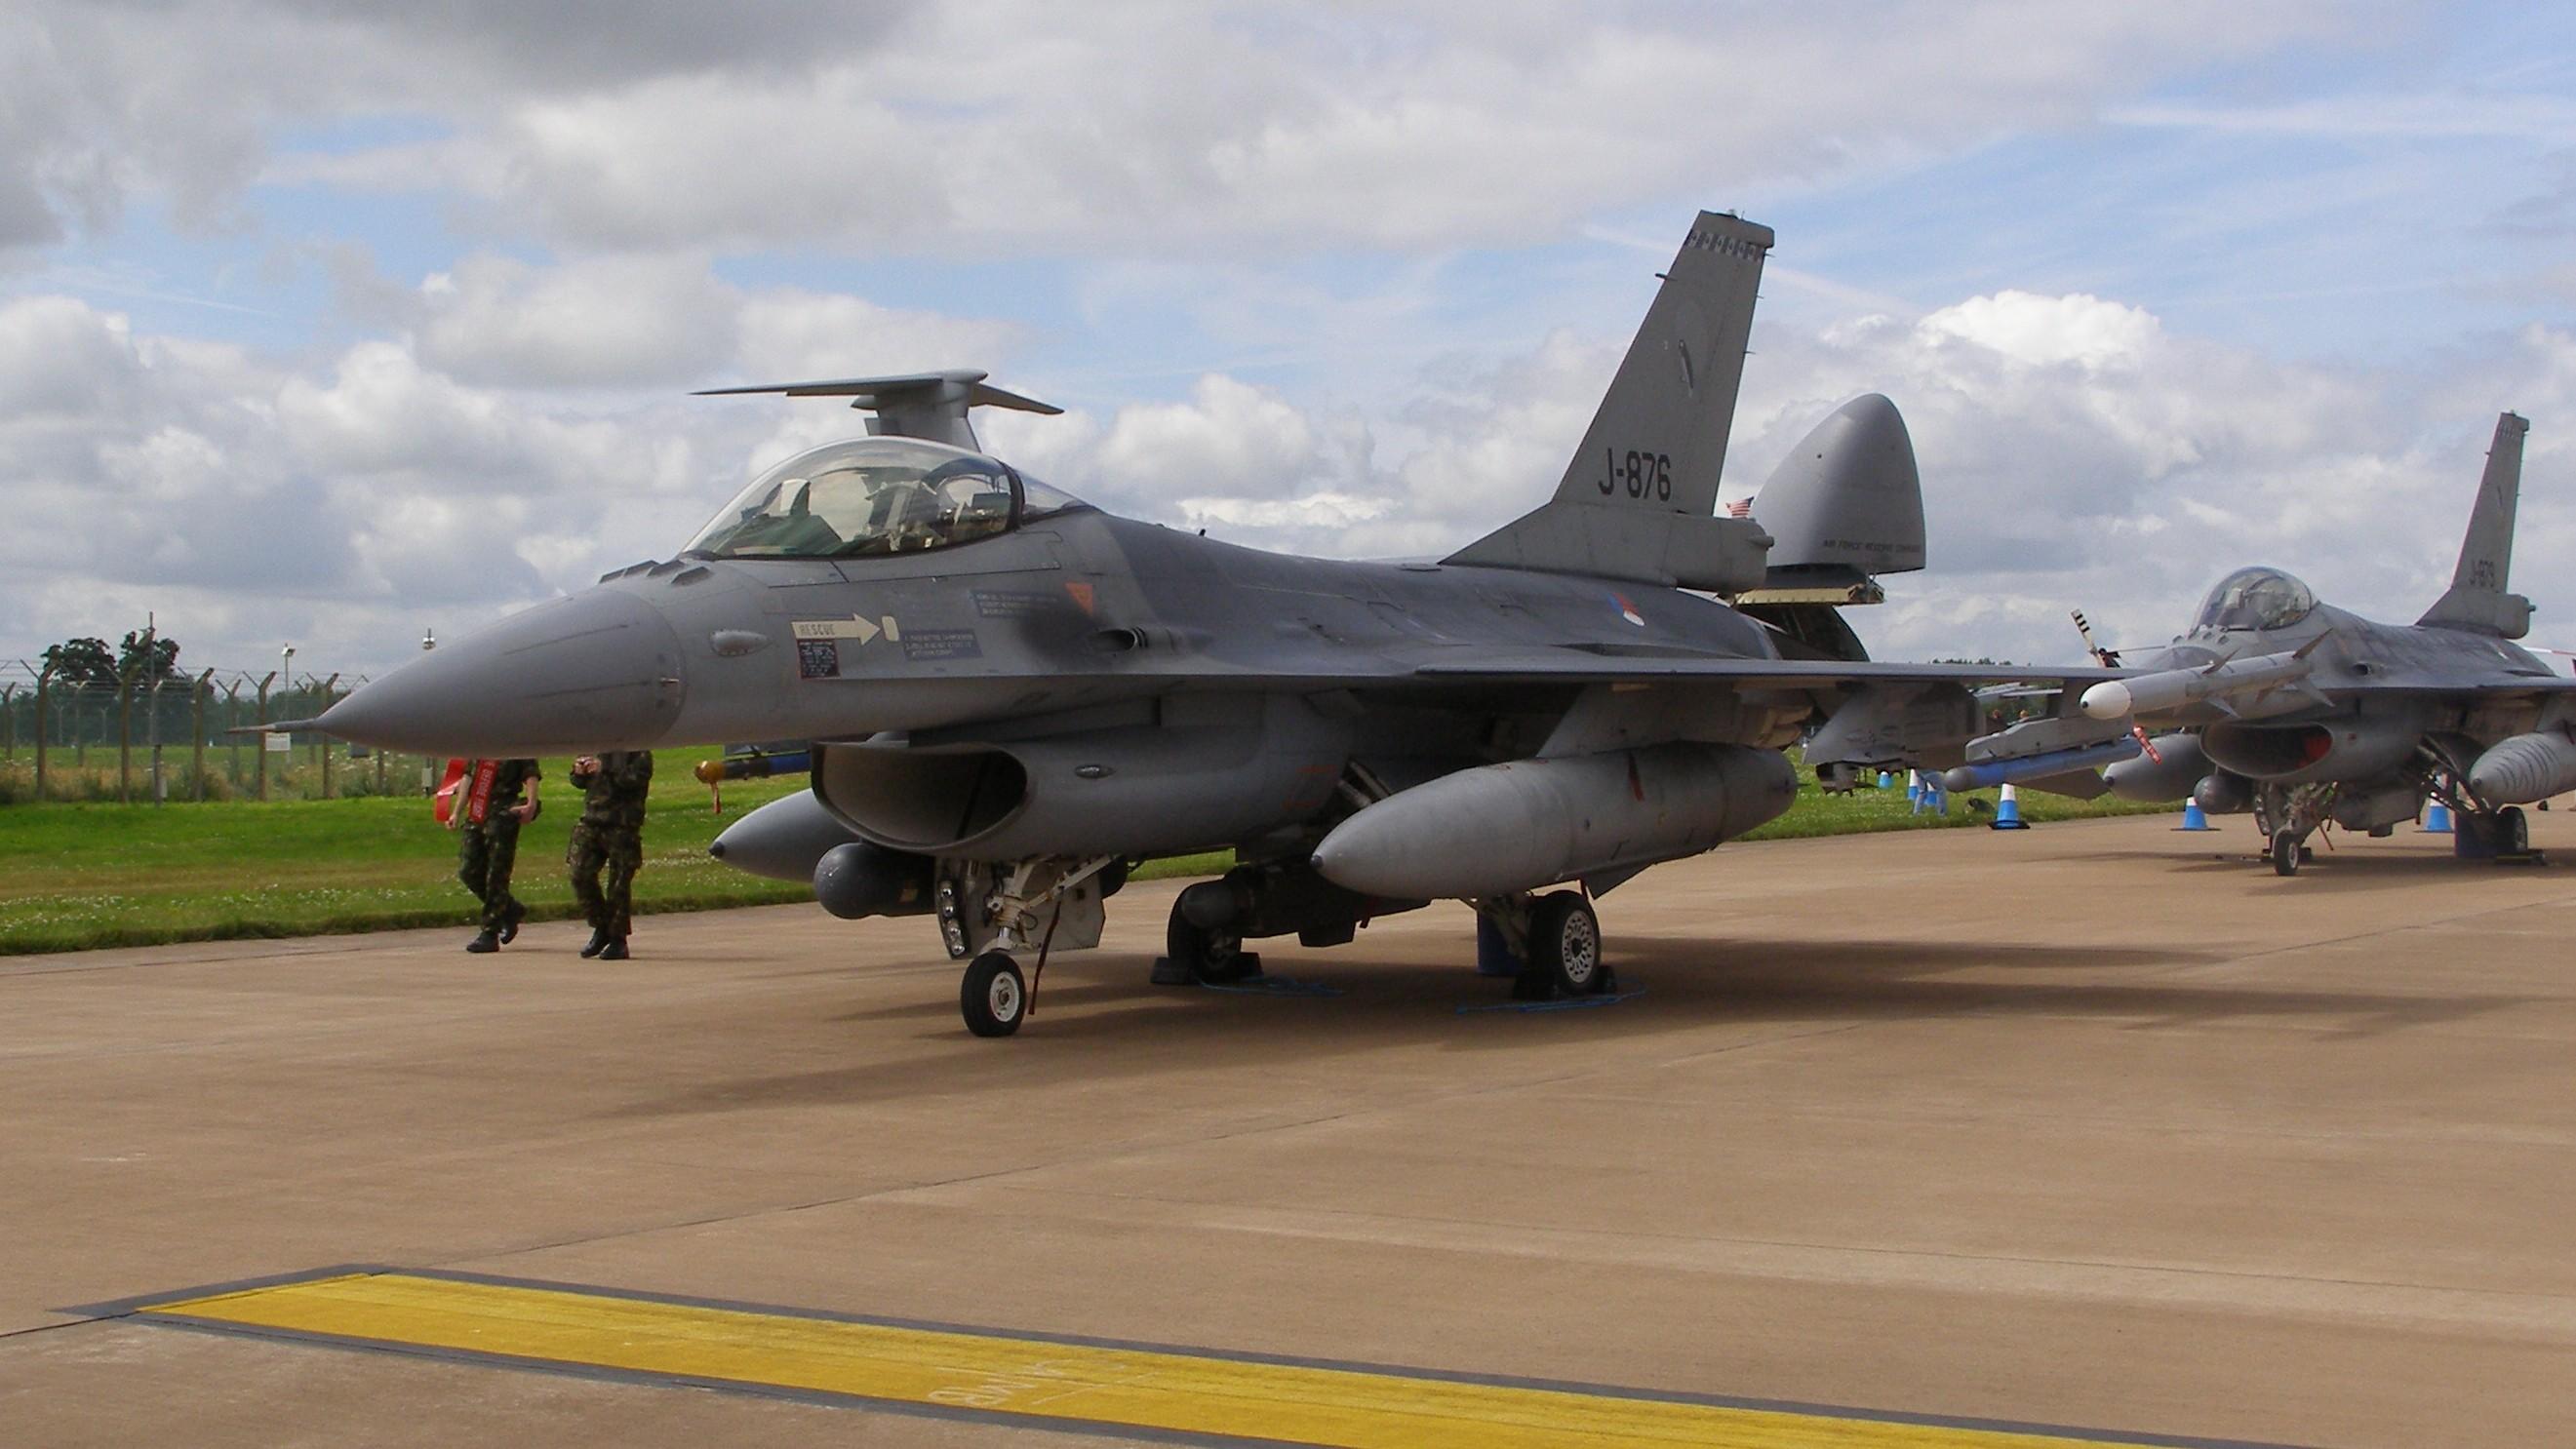 File:J-876-F-16-KLu-0265.jpg